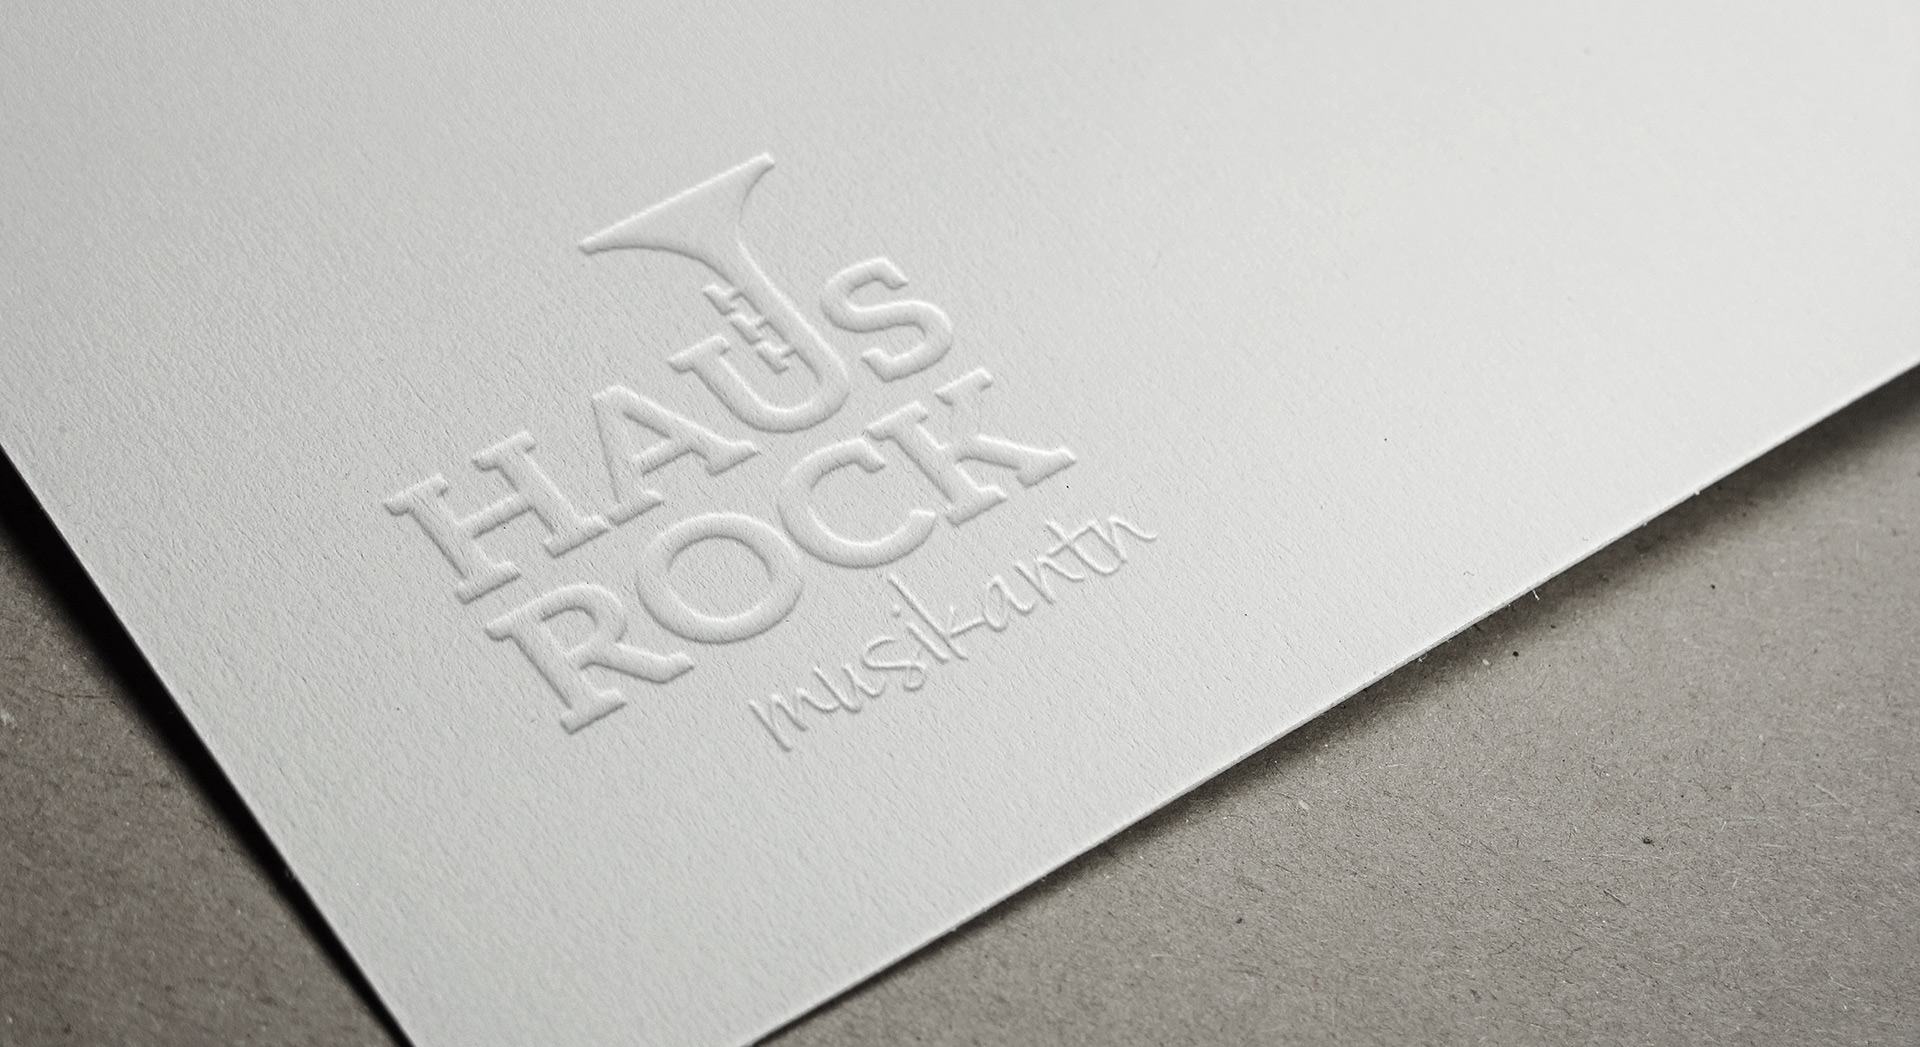 hausrock_paper.jpg